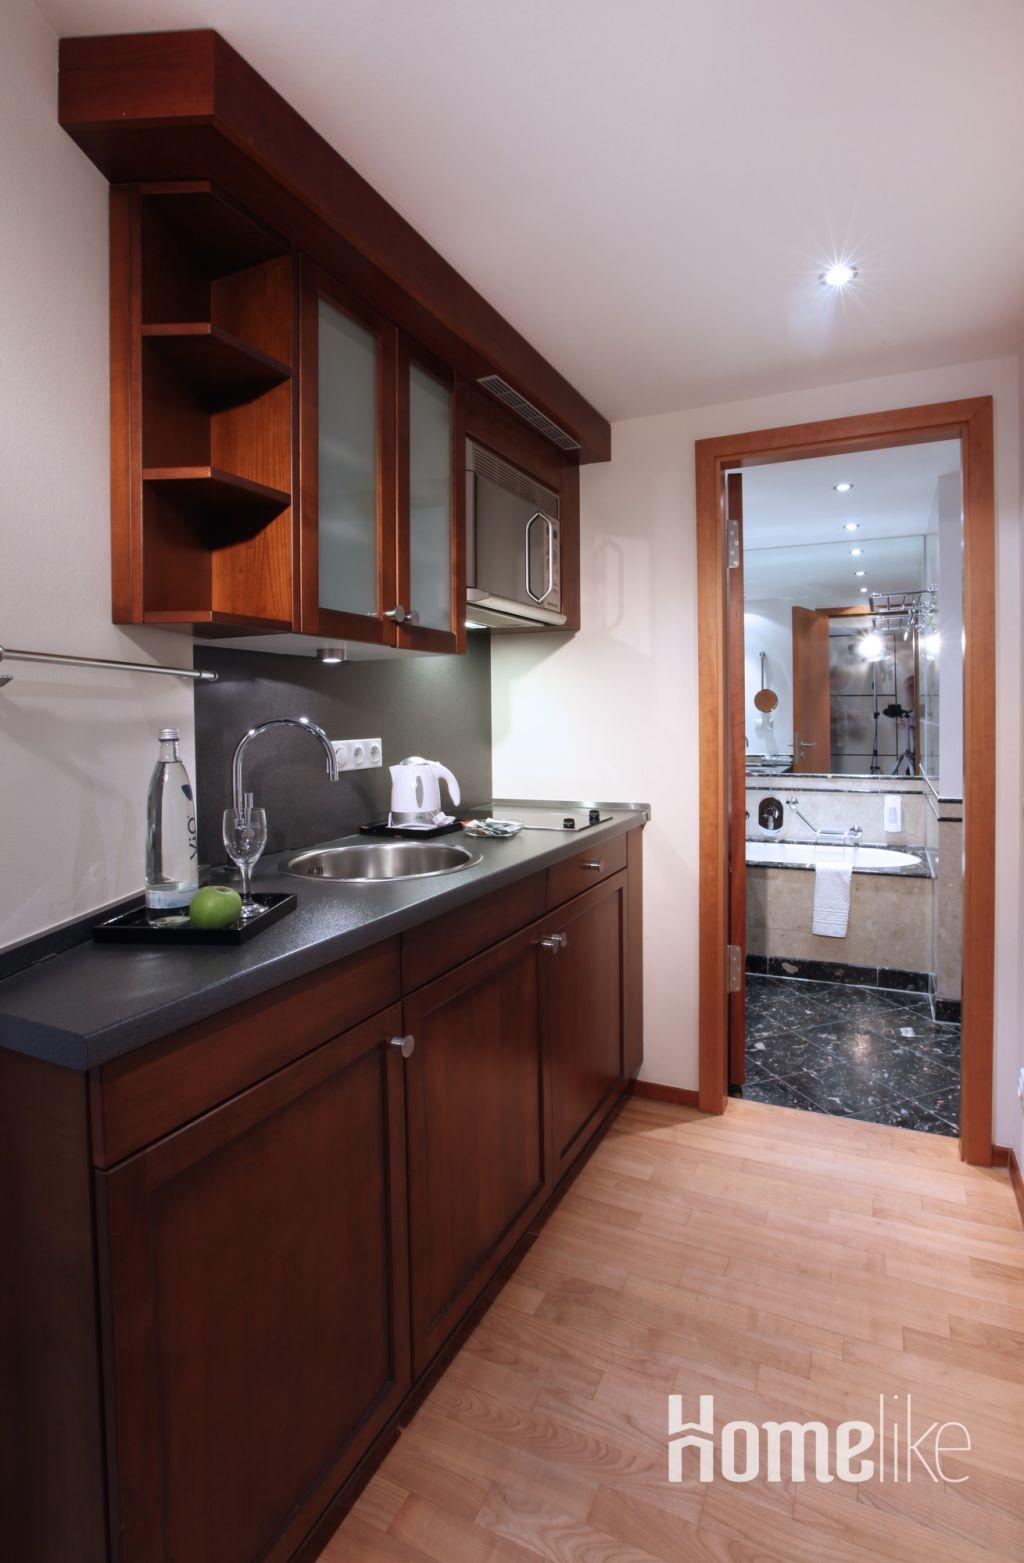 image 3 furnished 1 bedroom Apartment for rent in Sachsenhausen-Nord, Frankfurt